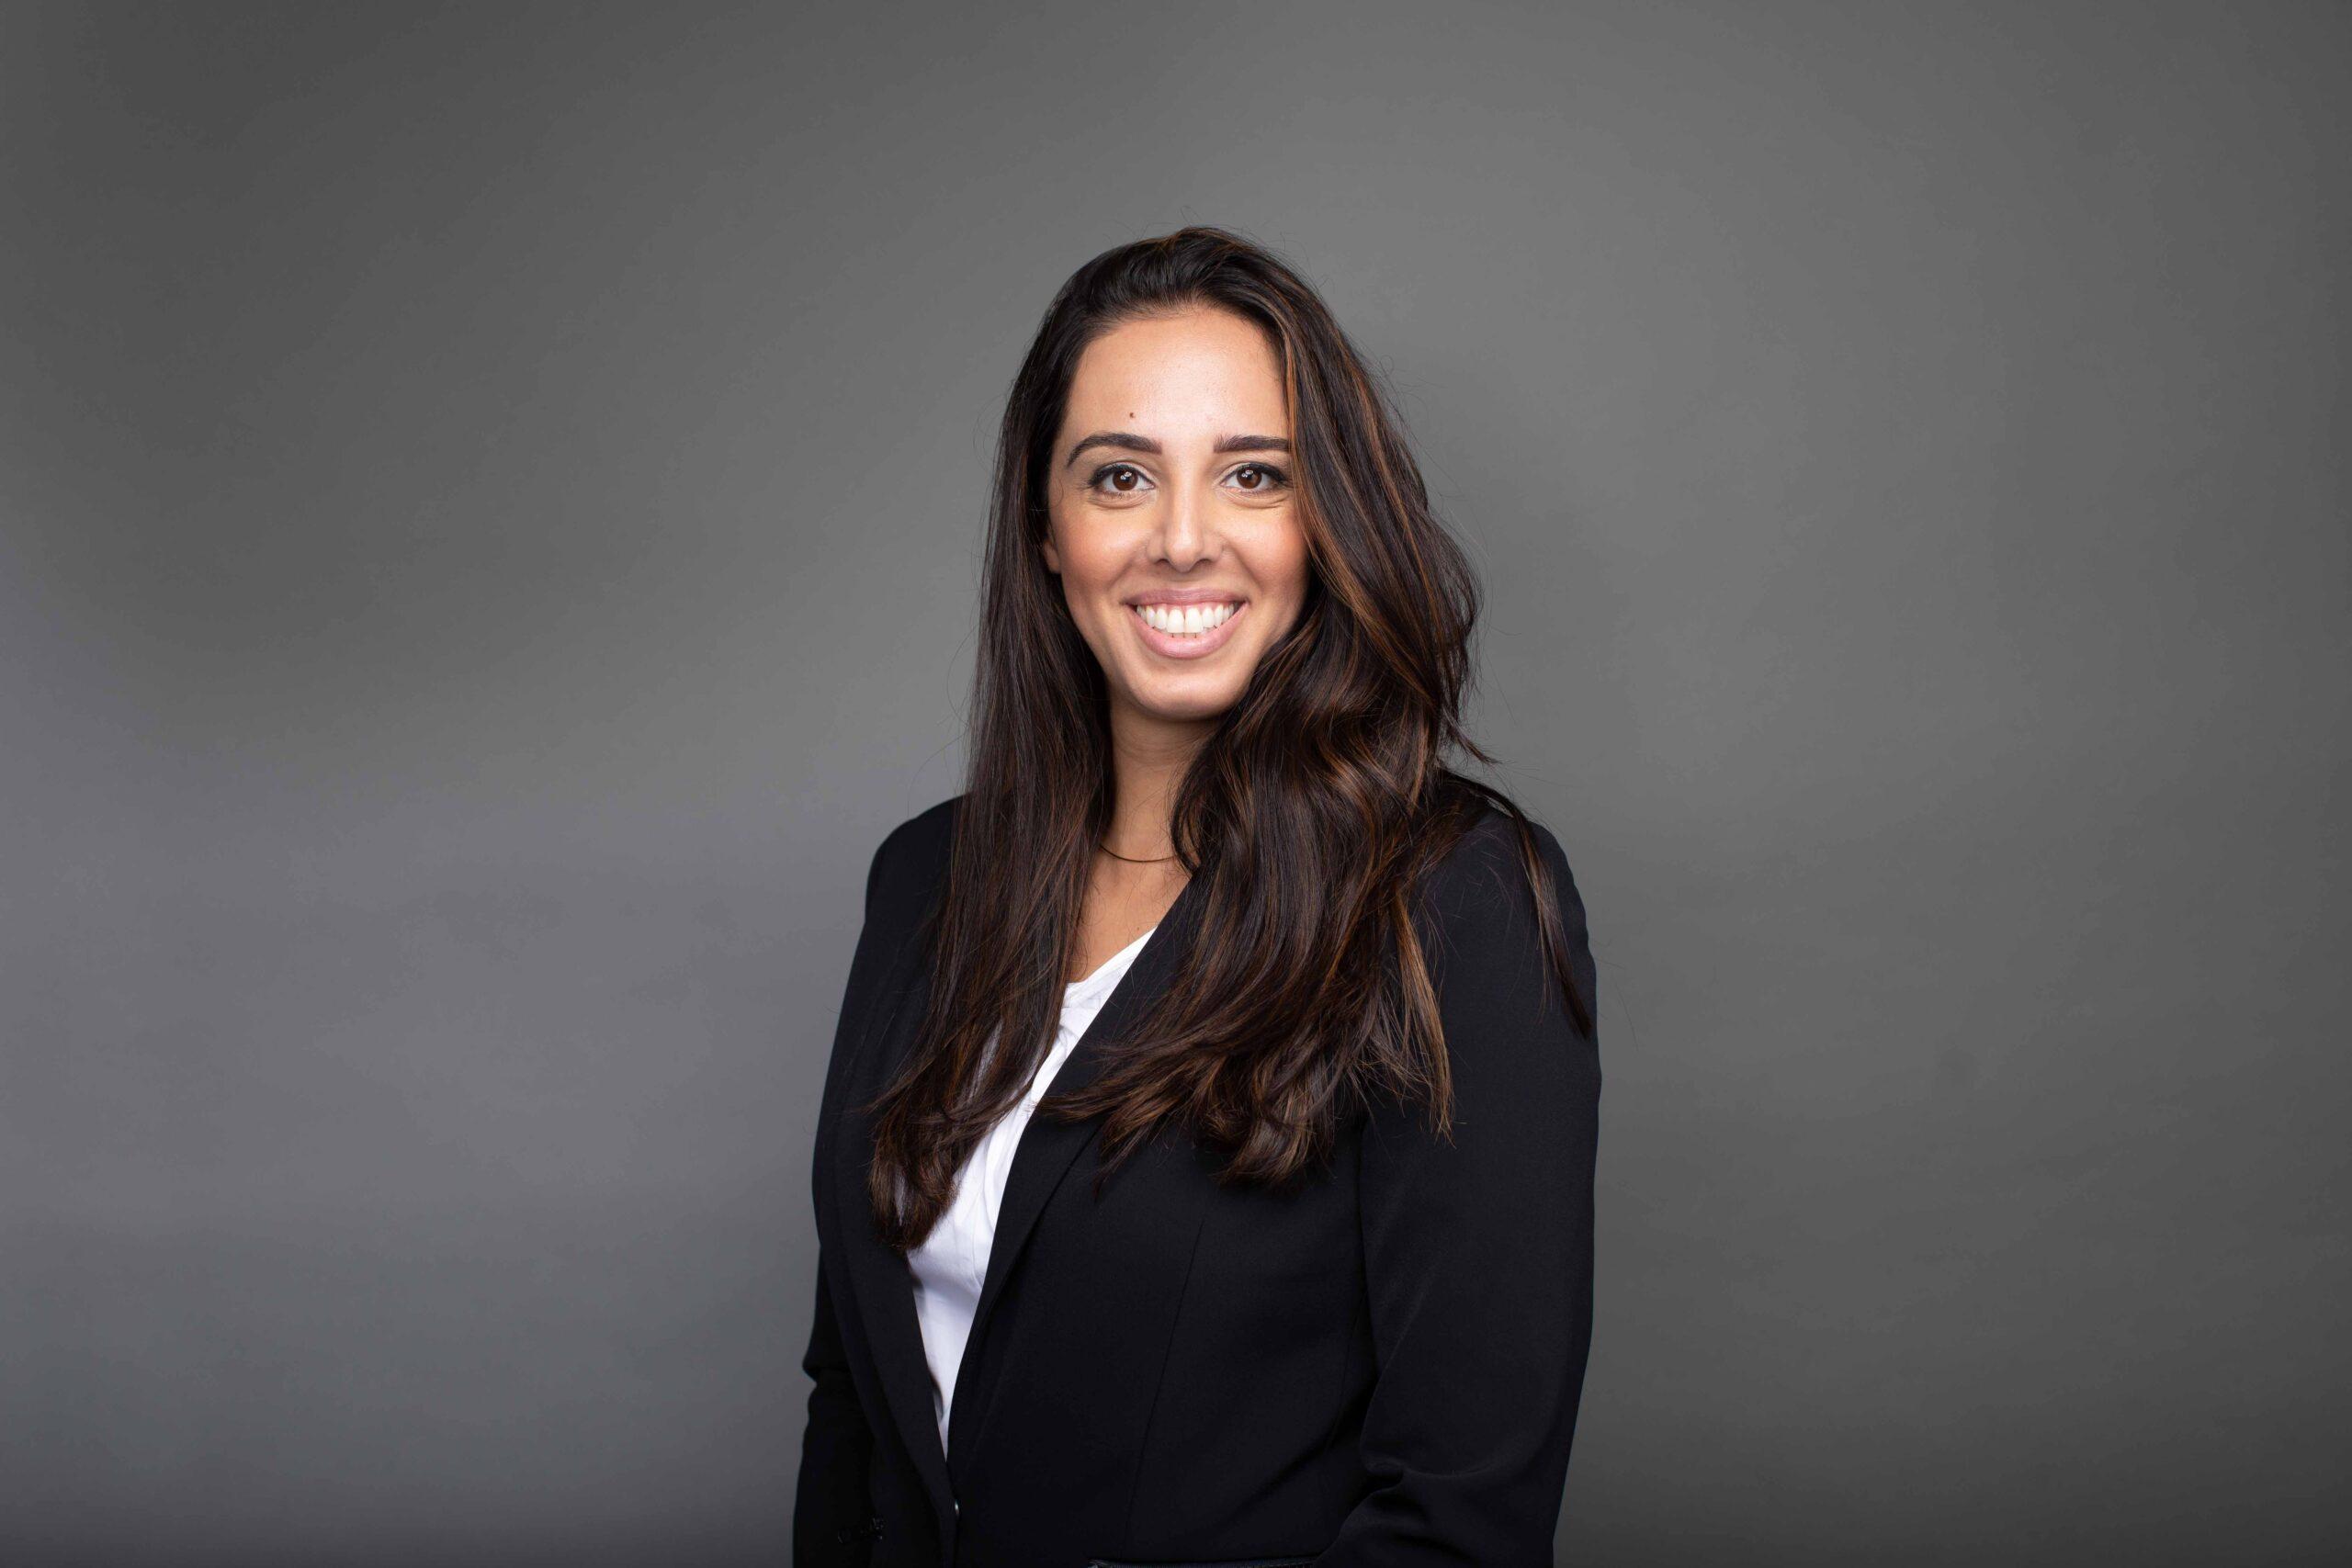 Jasmine-Abrams-attorney